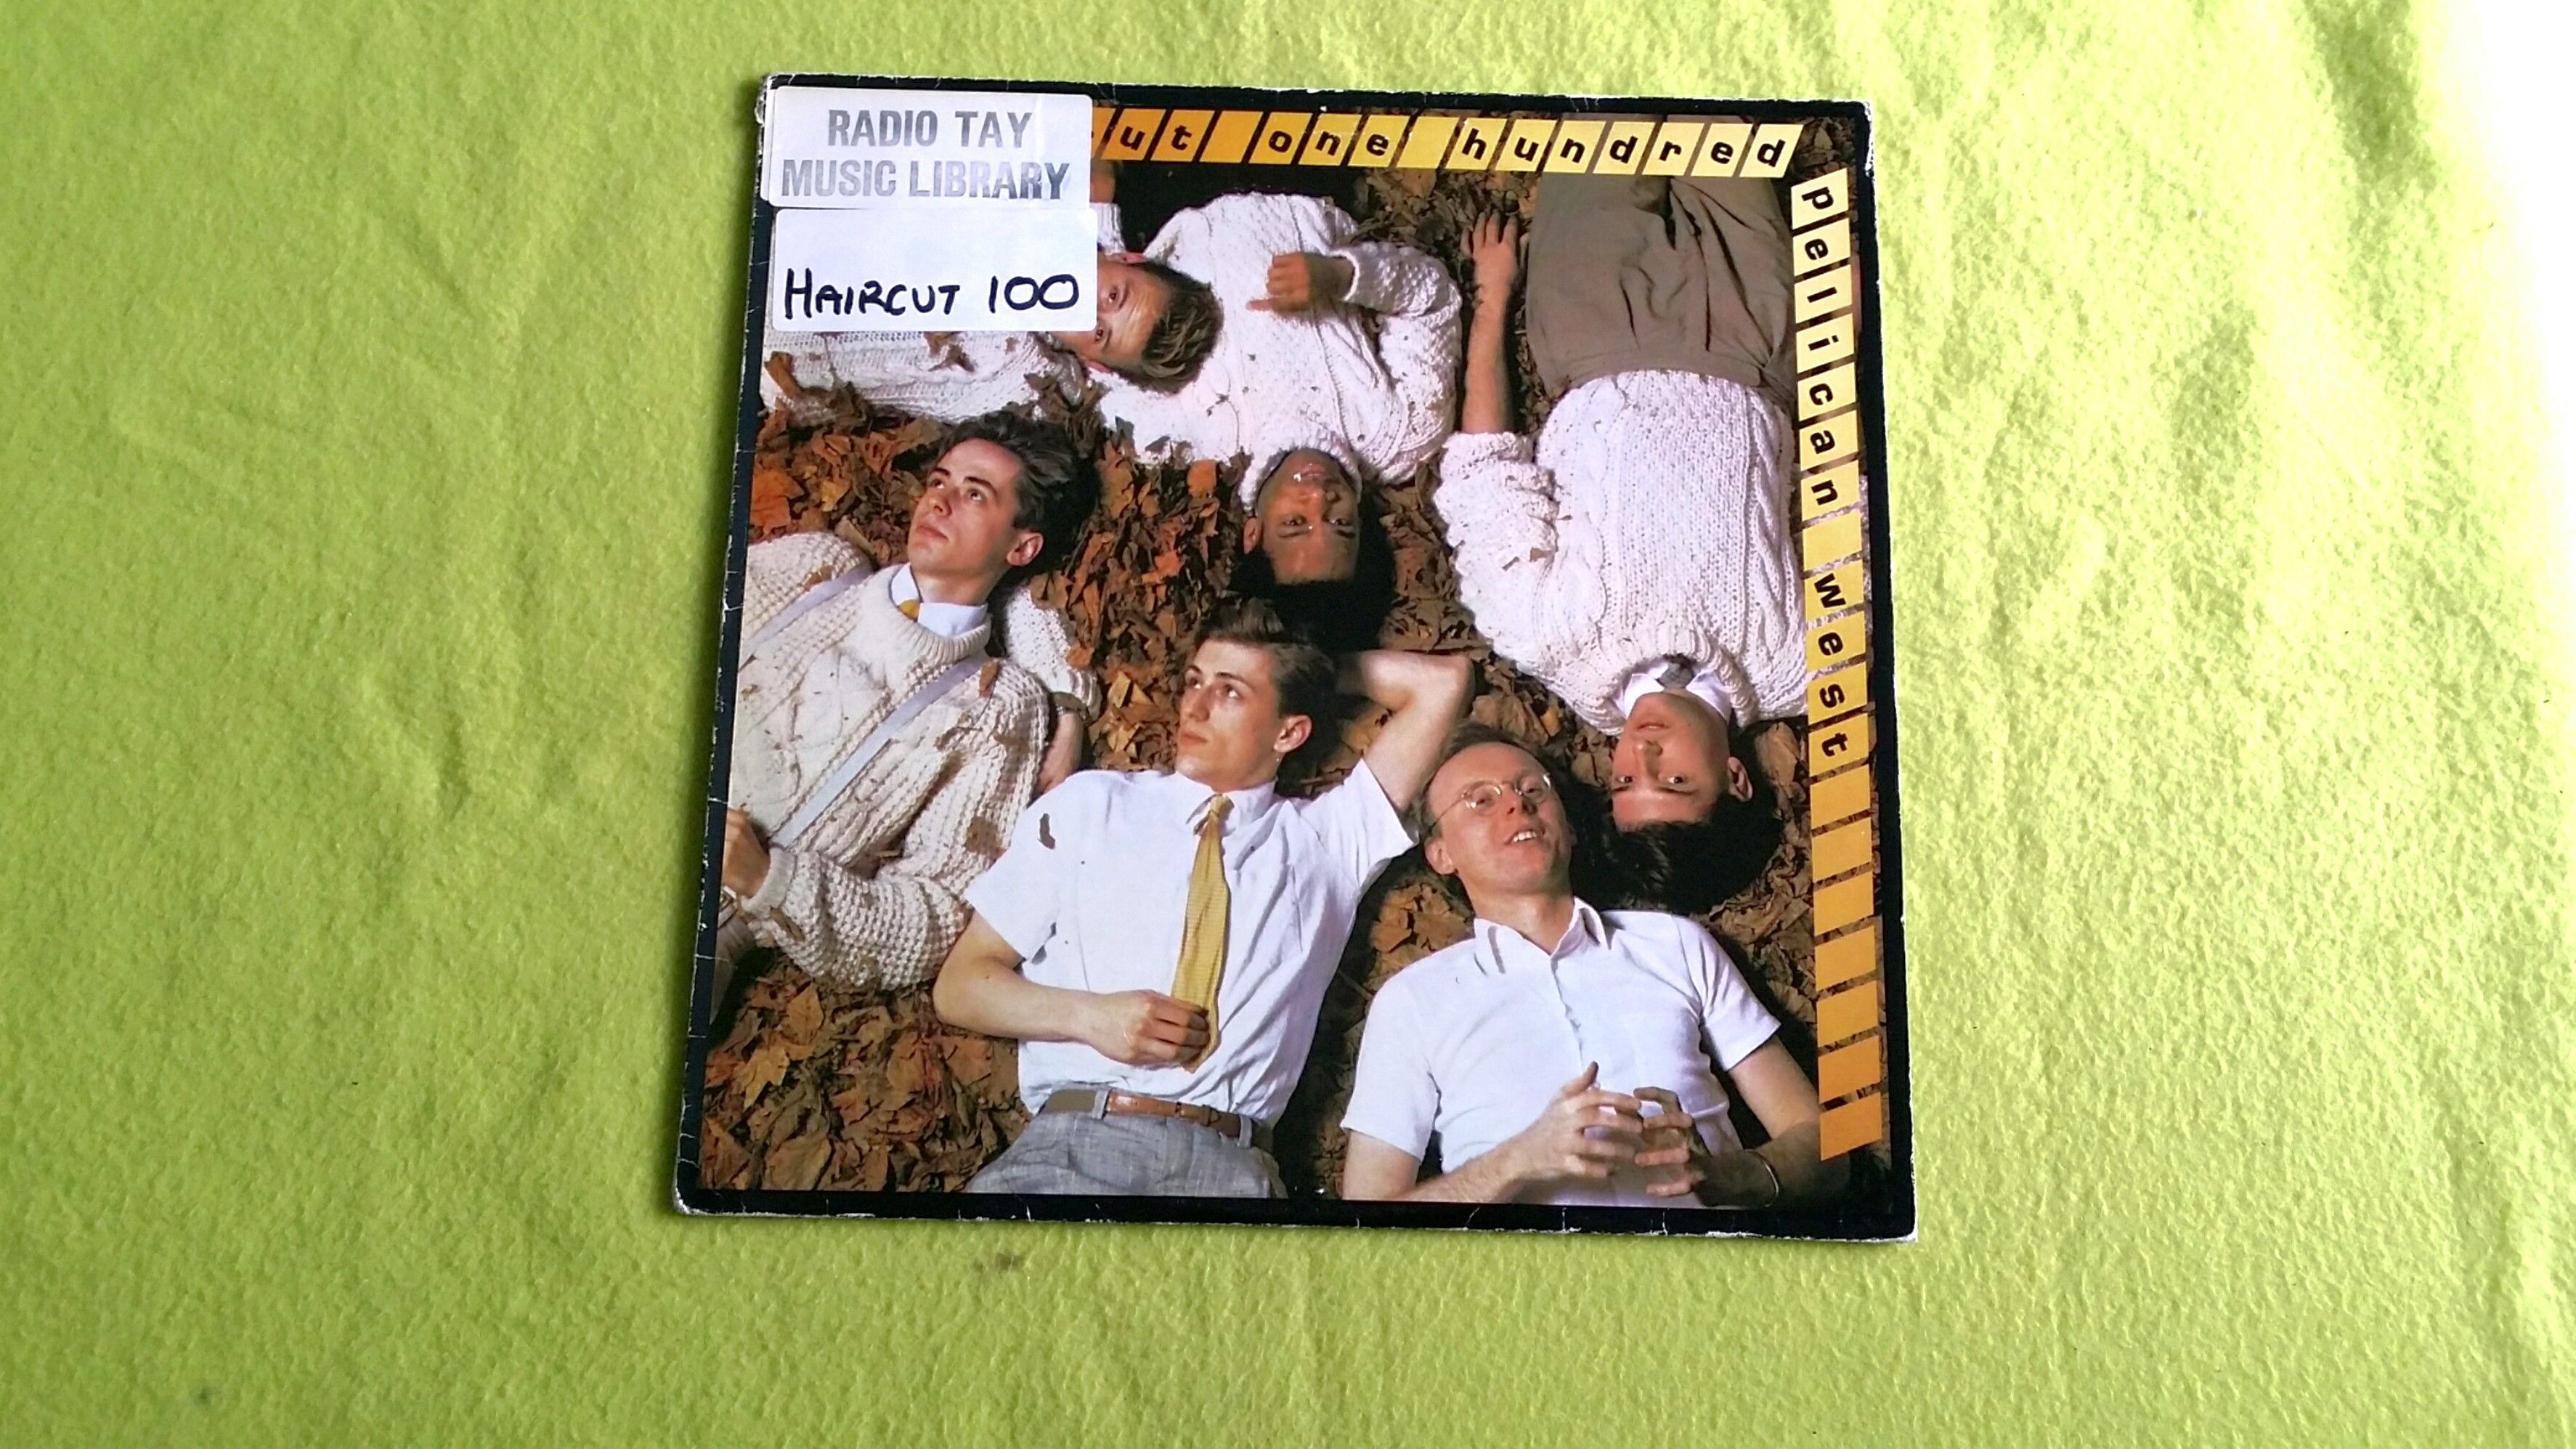 Haircut 100 Pelican West Love Plus One Vinyl Record Vintage